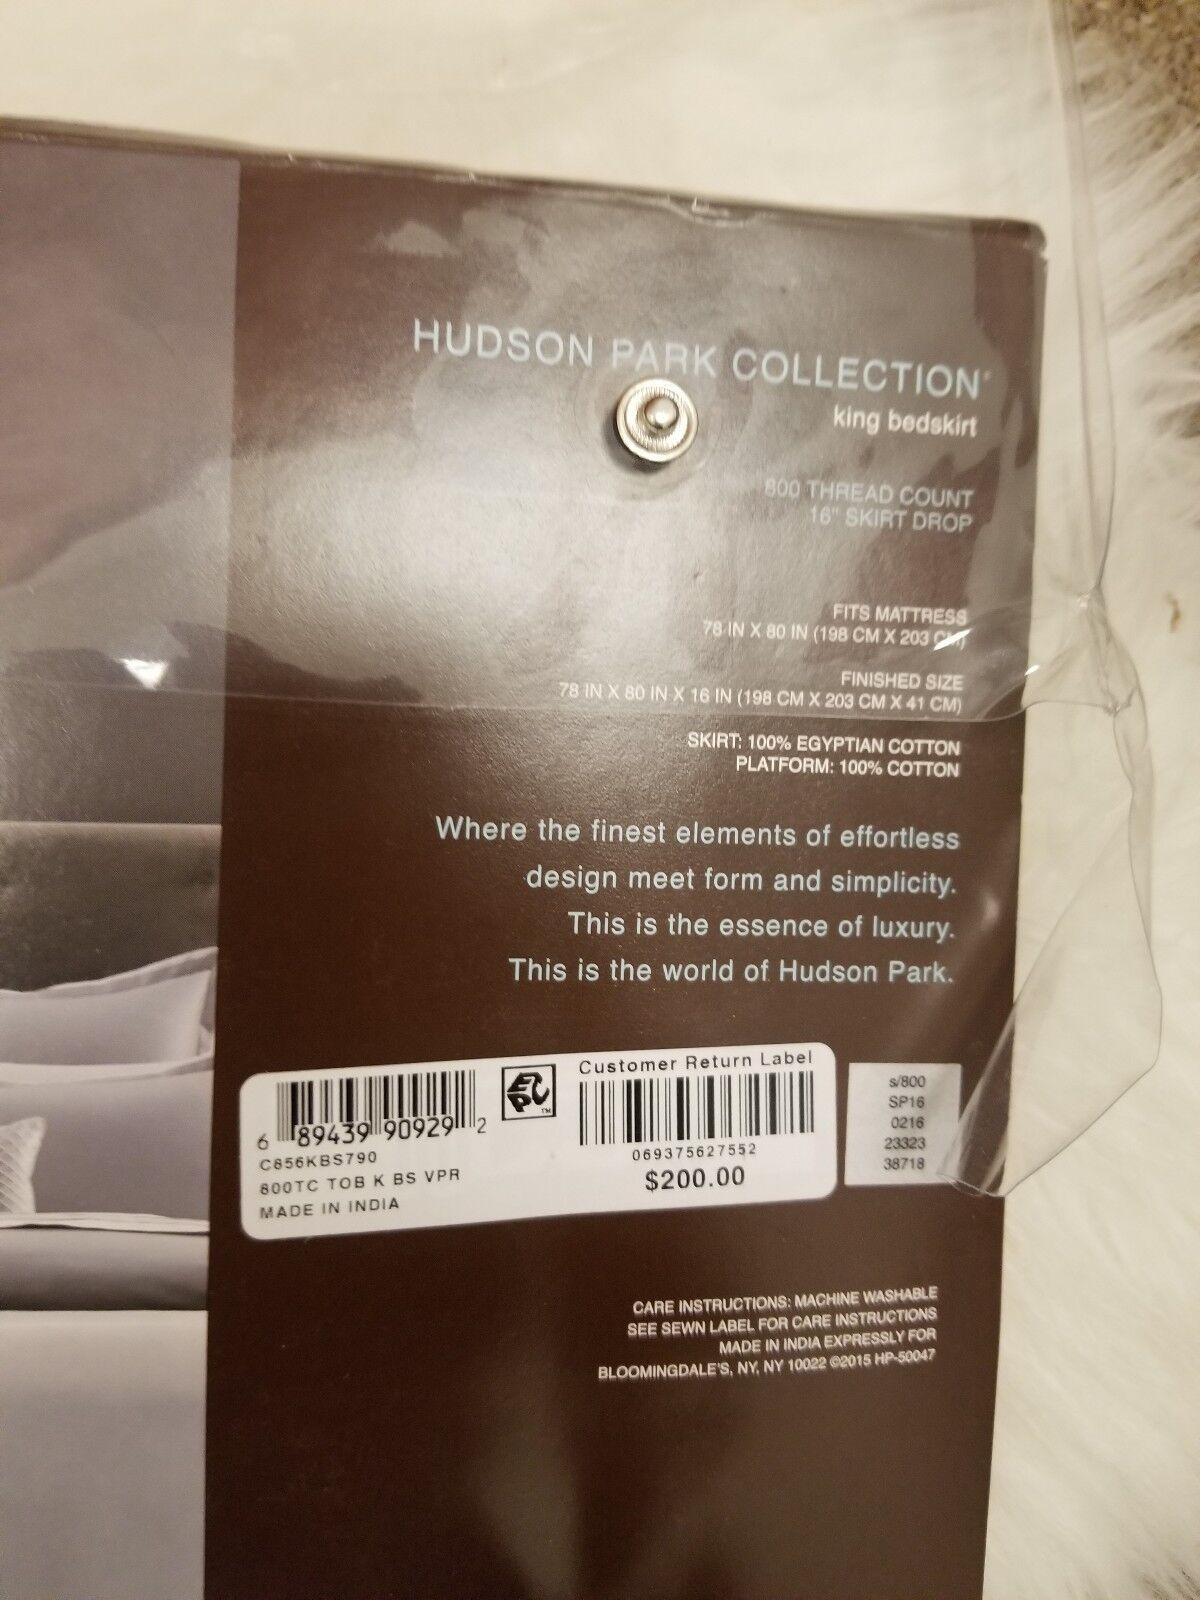 HUDSON PARK COLLECTION KING BEDSKIRT 800TC VAPOR GRAY 100 /% EGYPTIAN COTTON